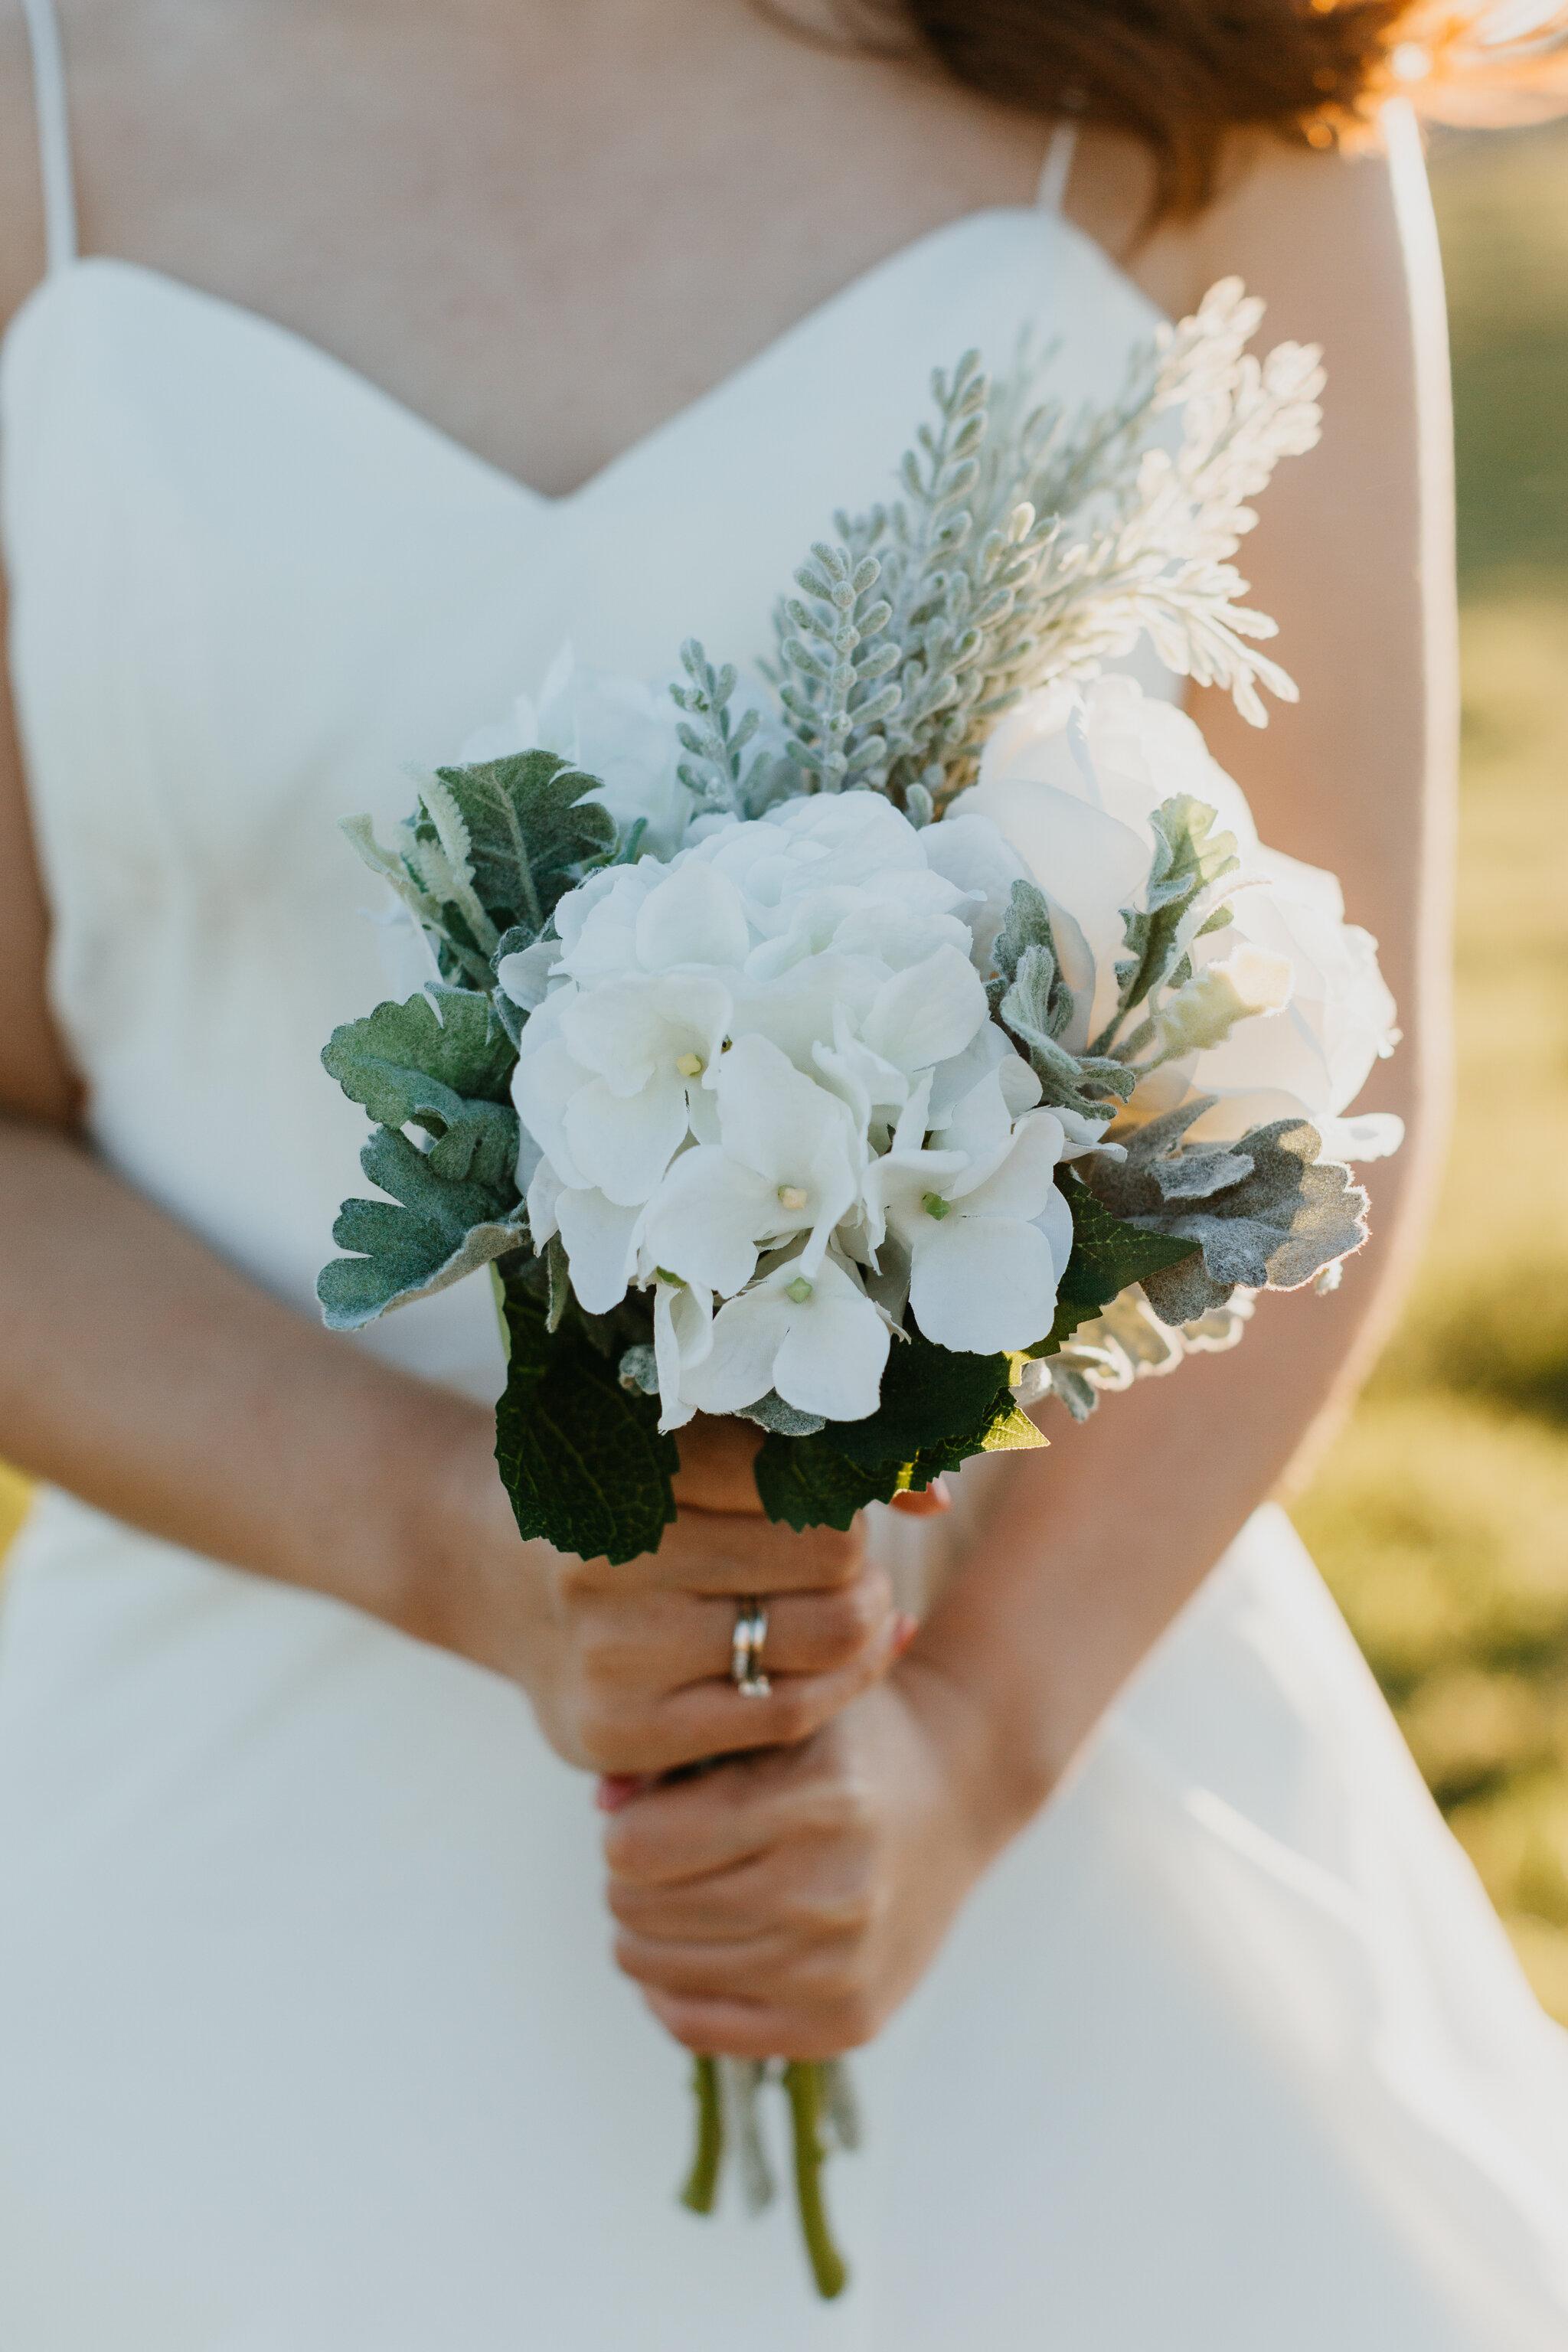 Maleny One Tree Hill Wedding - Maleny Wedding Photographer-5.jpg